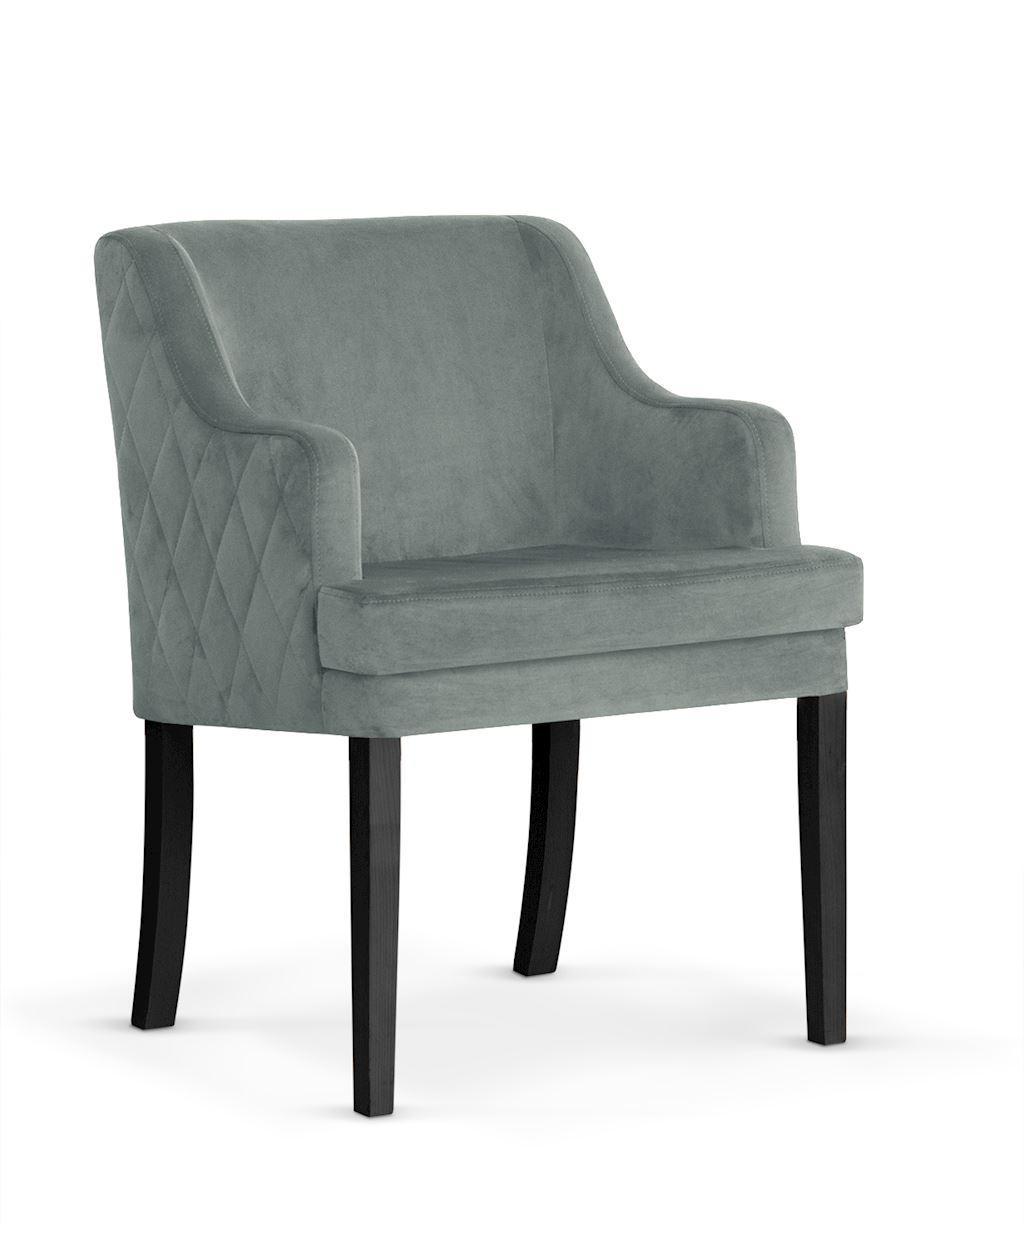 Fotoliu fix tapitat cu stofa, cu picioare din lemn Grand Grey / Black, l58xA60xH89 cm imagine